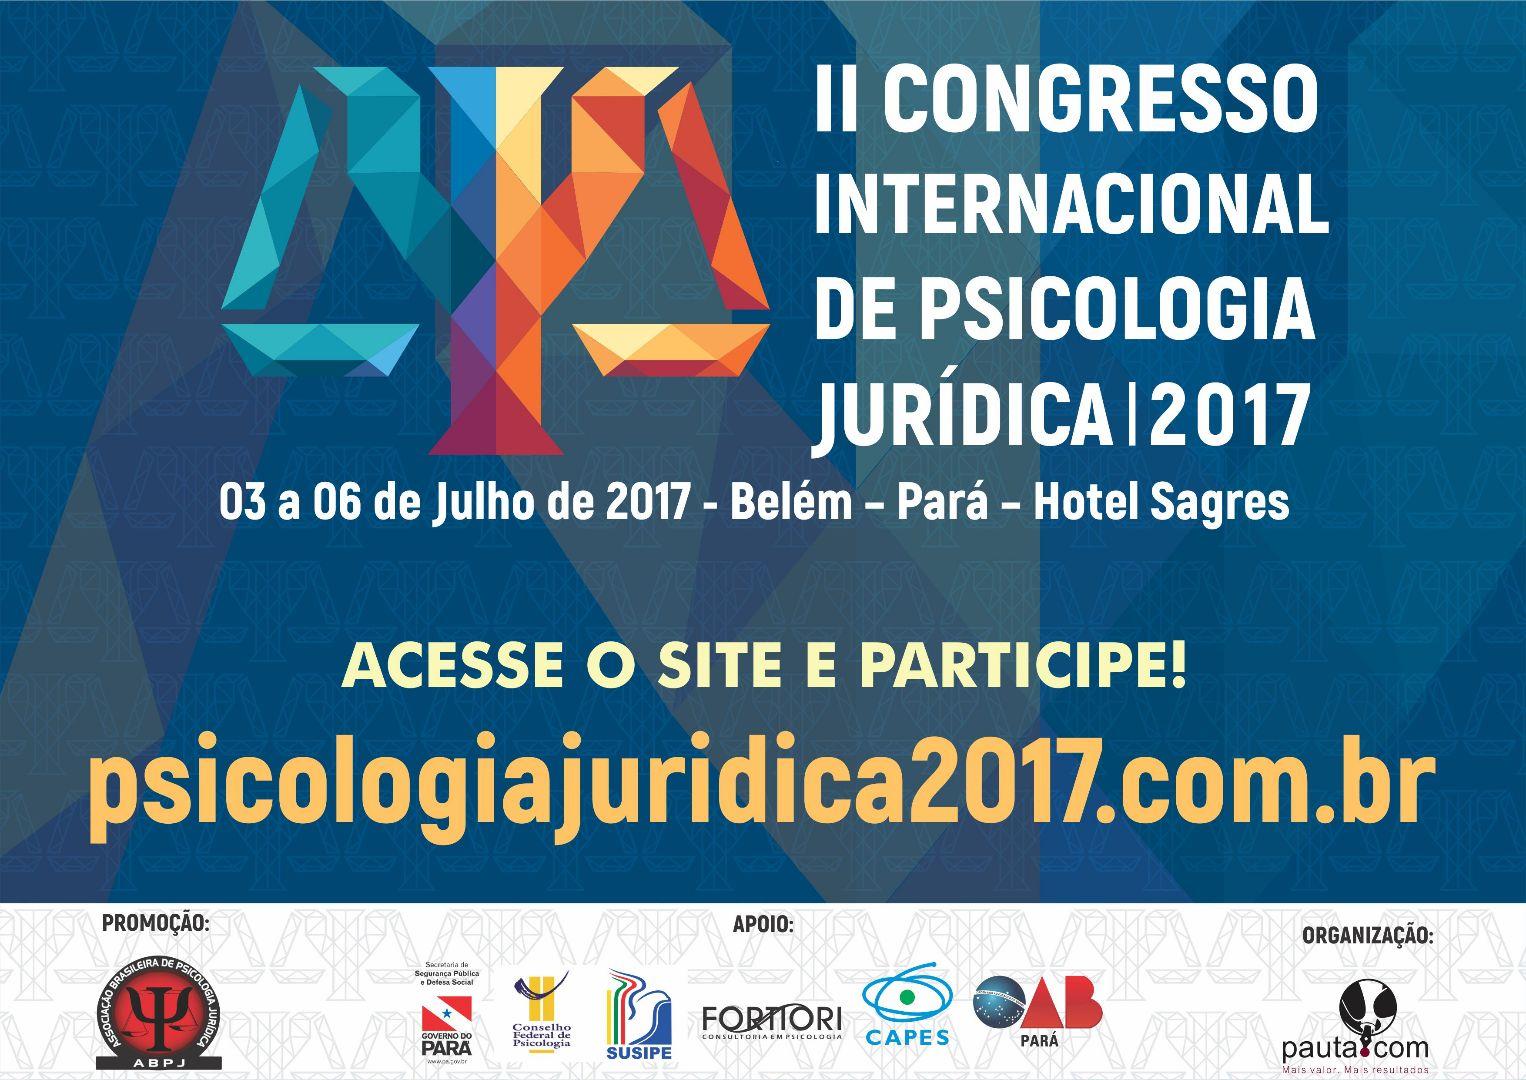 II CONGRESSO INTERNACIONAL DE PSICOLOGIA JURIDICA